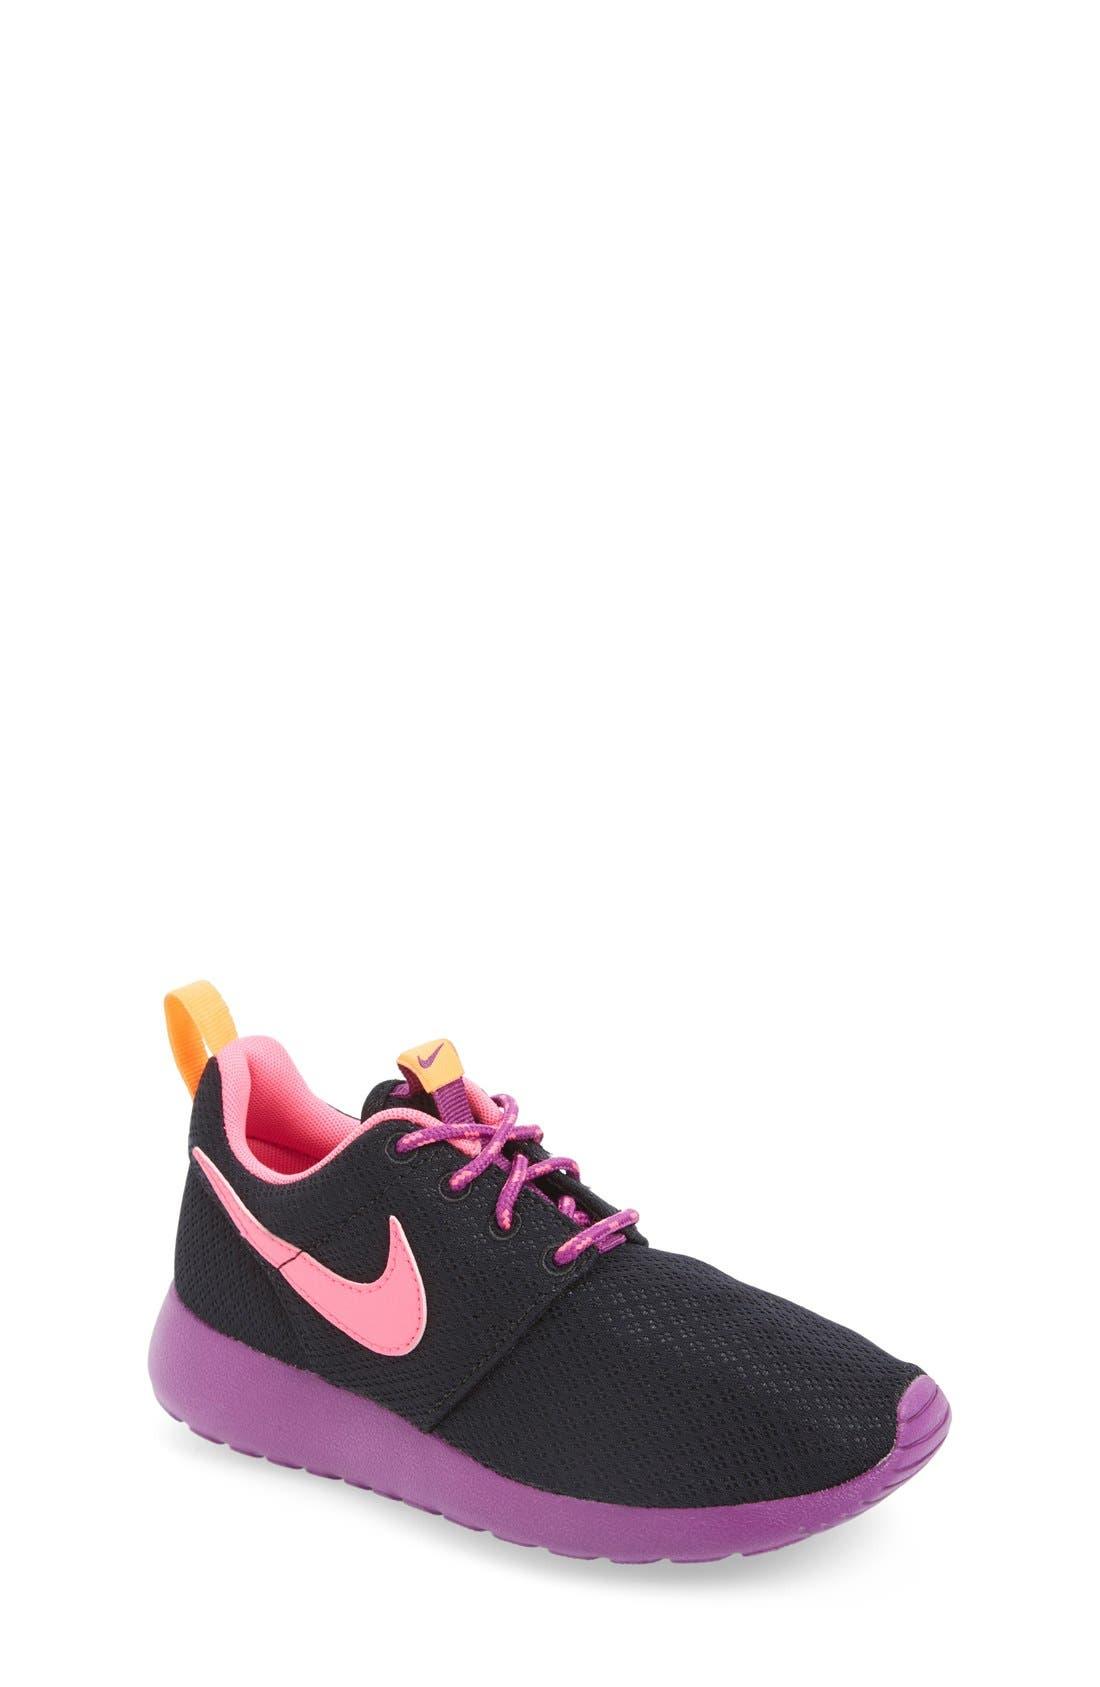 'Roshe Run' Athletic Shoe,                             Main thumbnail 17, color,